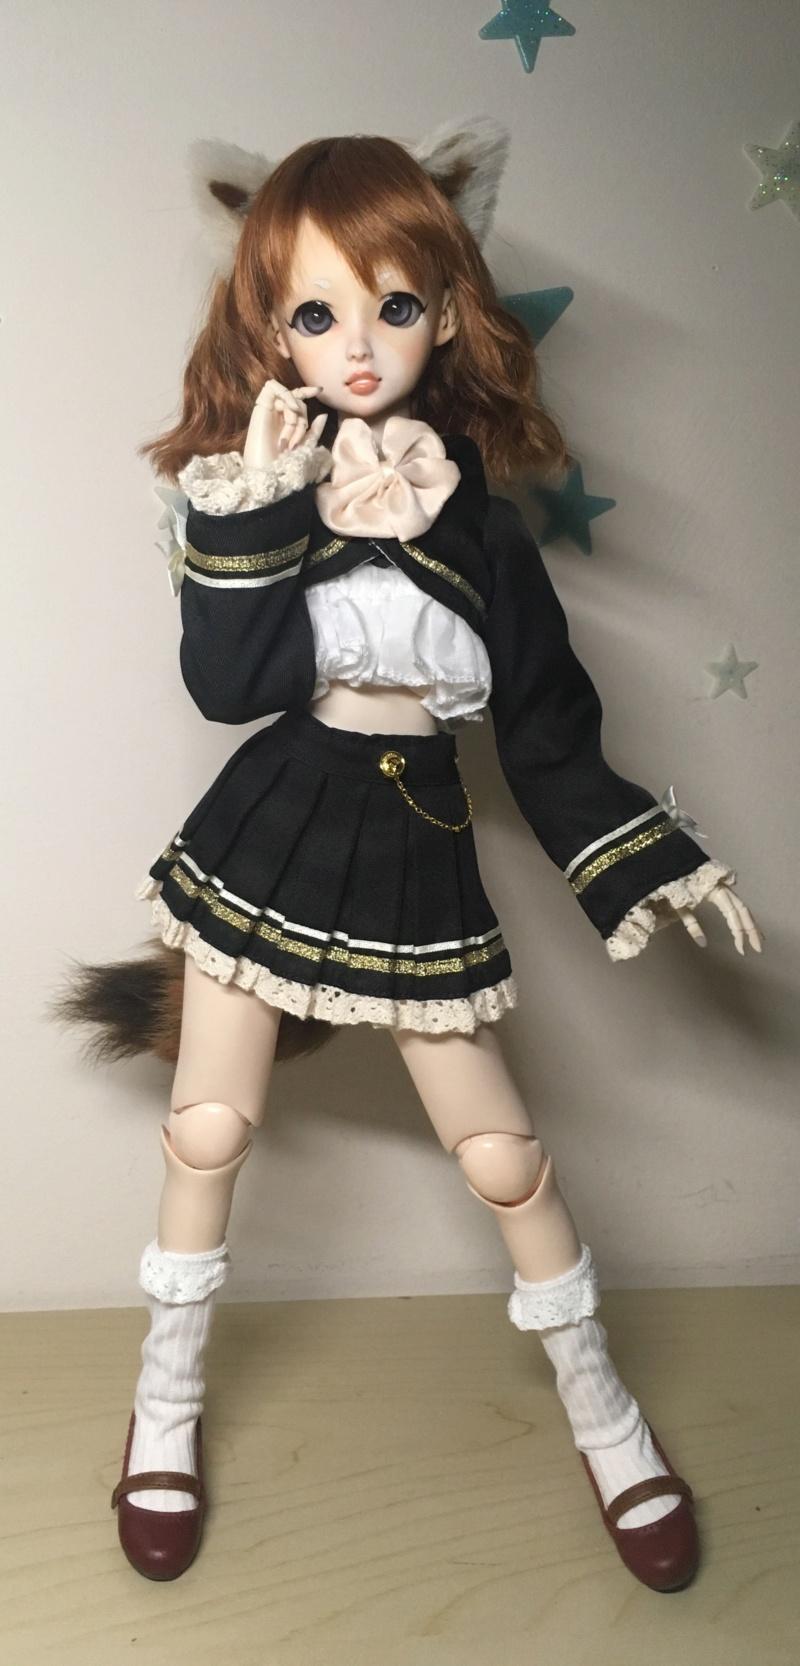 [vente] résine/vinyl doll furry panda roux  B7e0a110